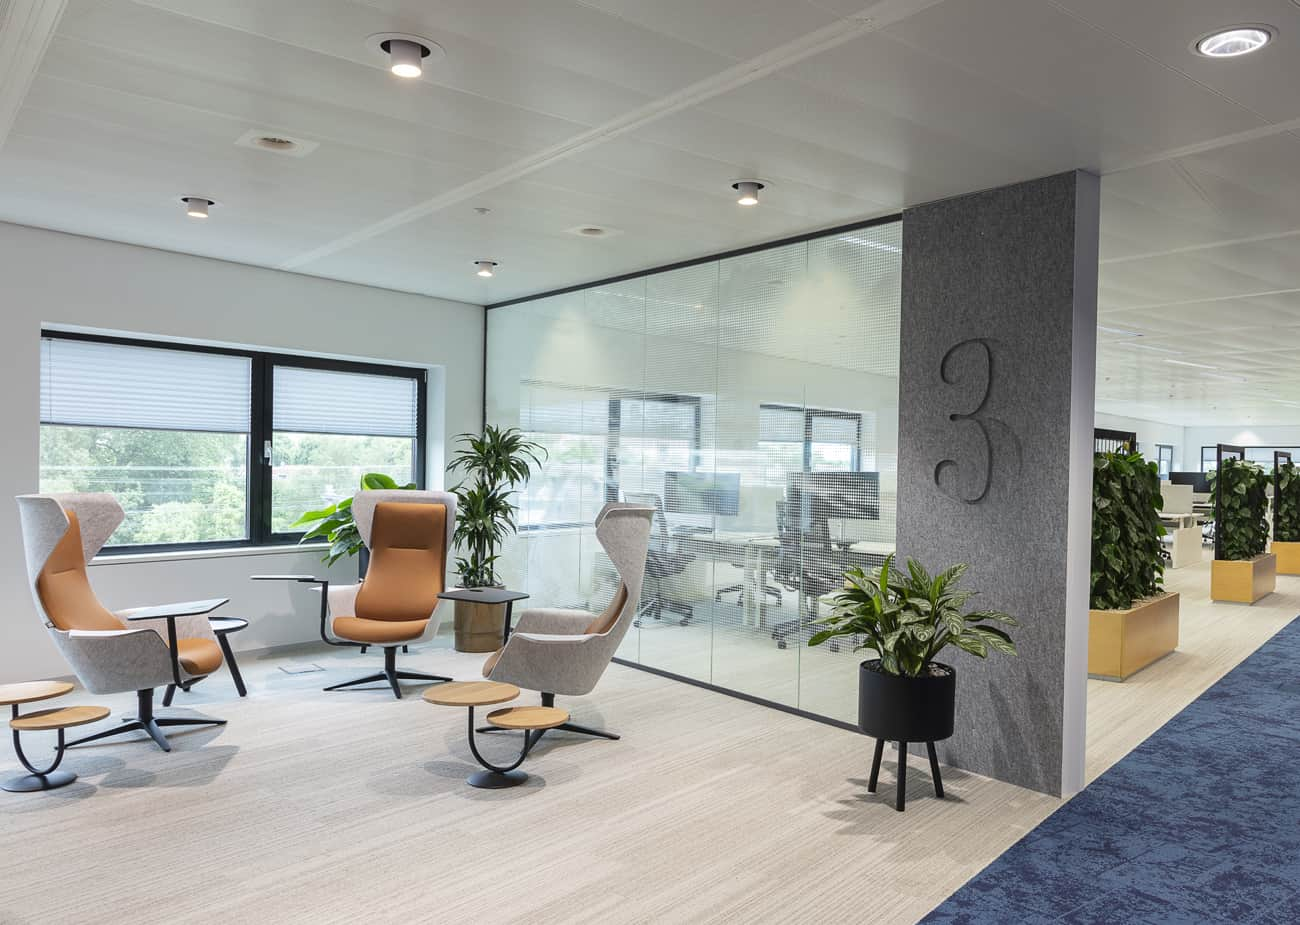 Ontwikkelingsbank, Den-Haag | Plan Effect